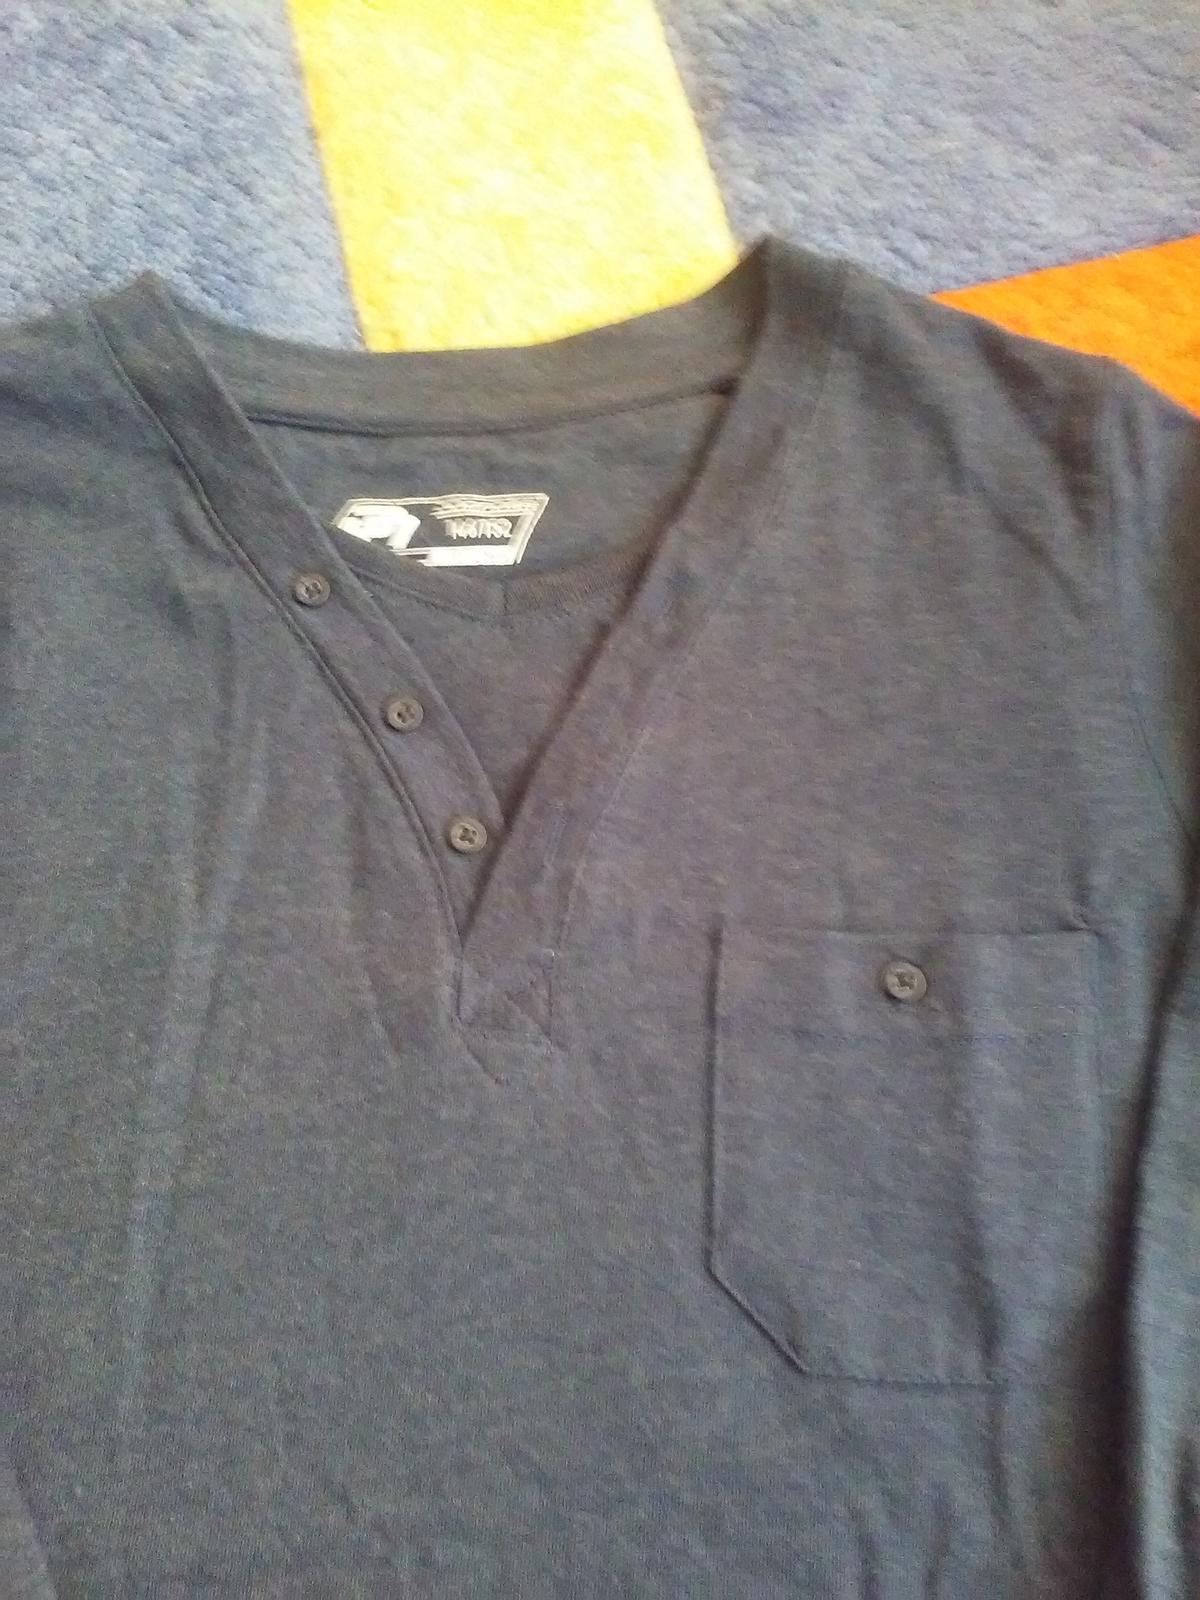 Tmavomodré elegantné tričko - Obrázok č. 3